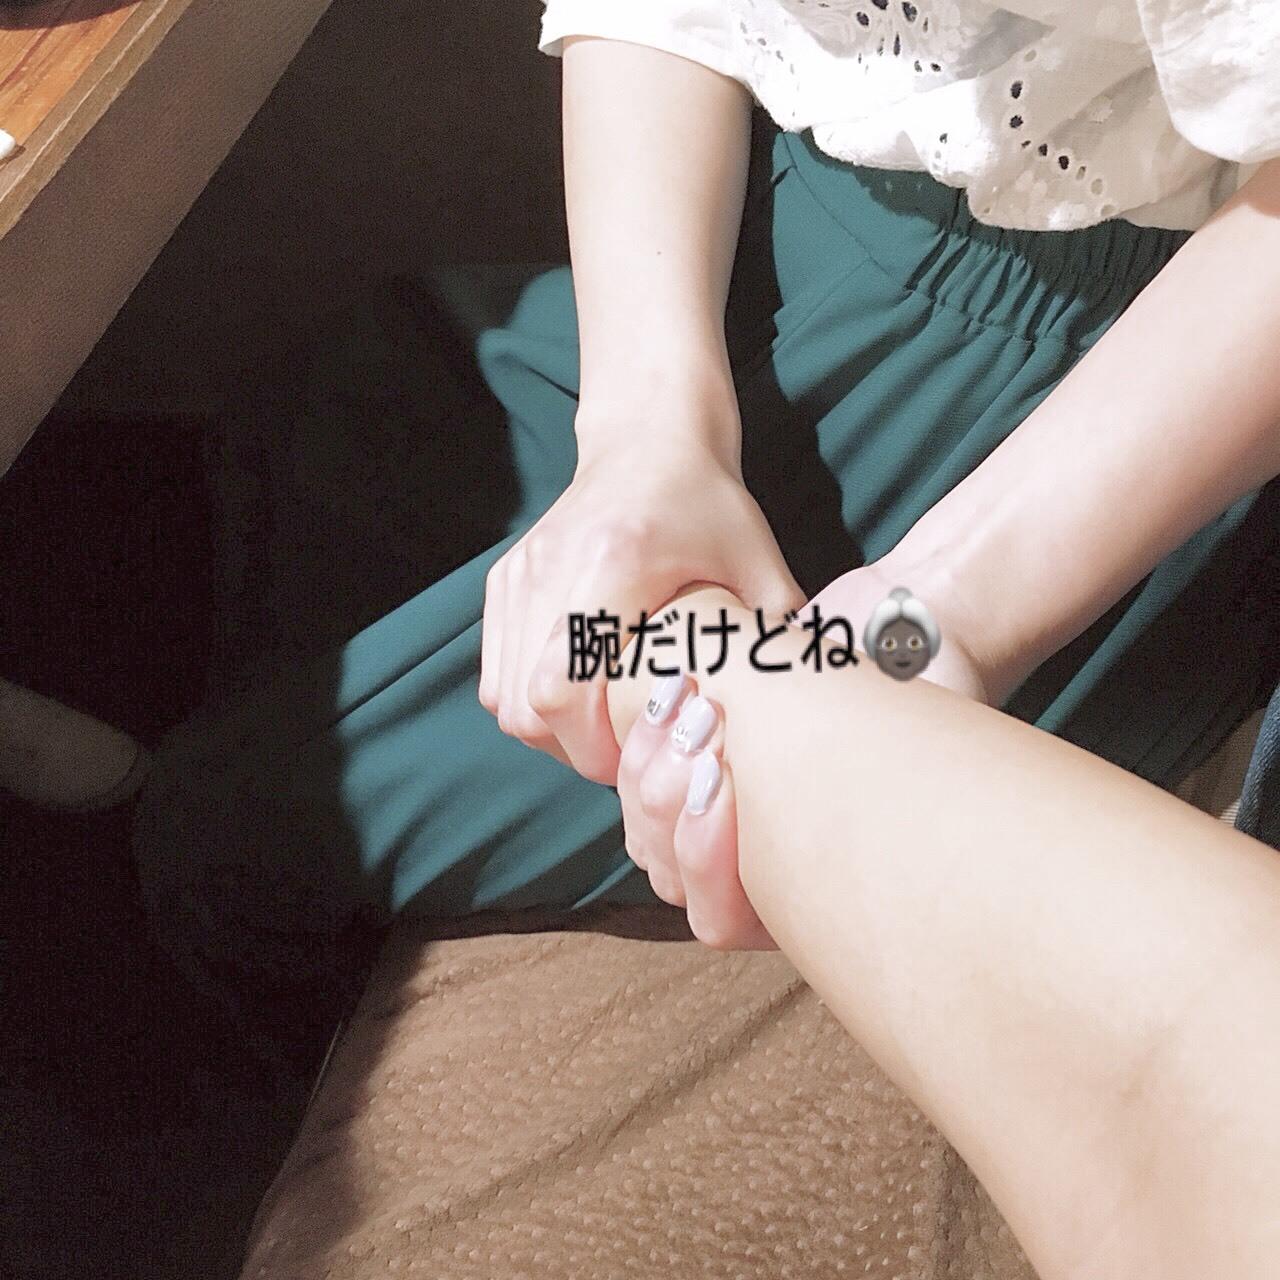 S__35299354.jpg